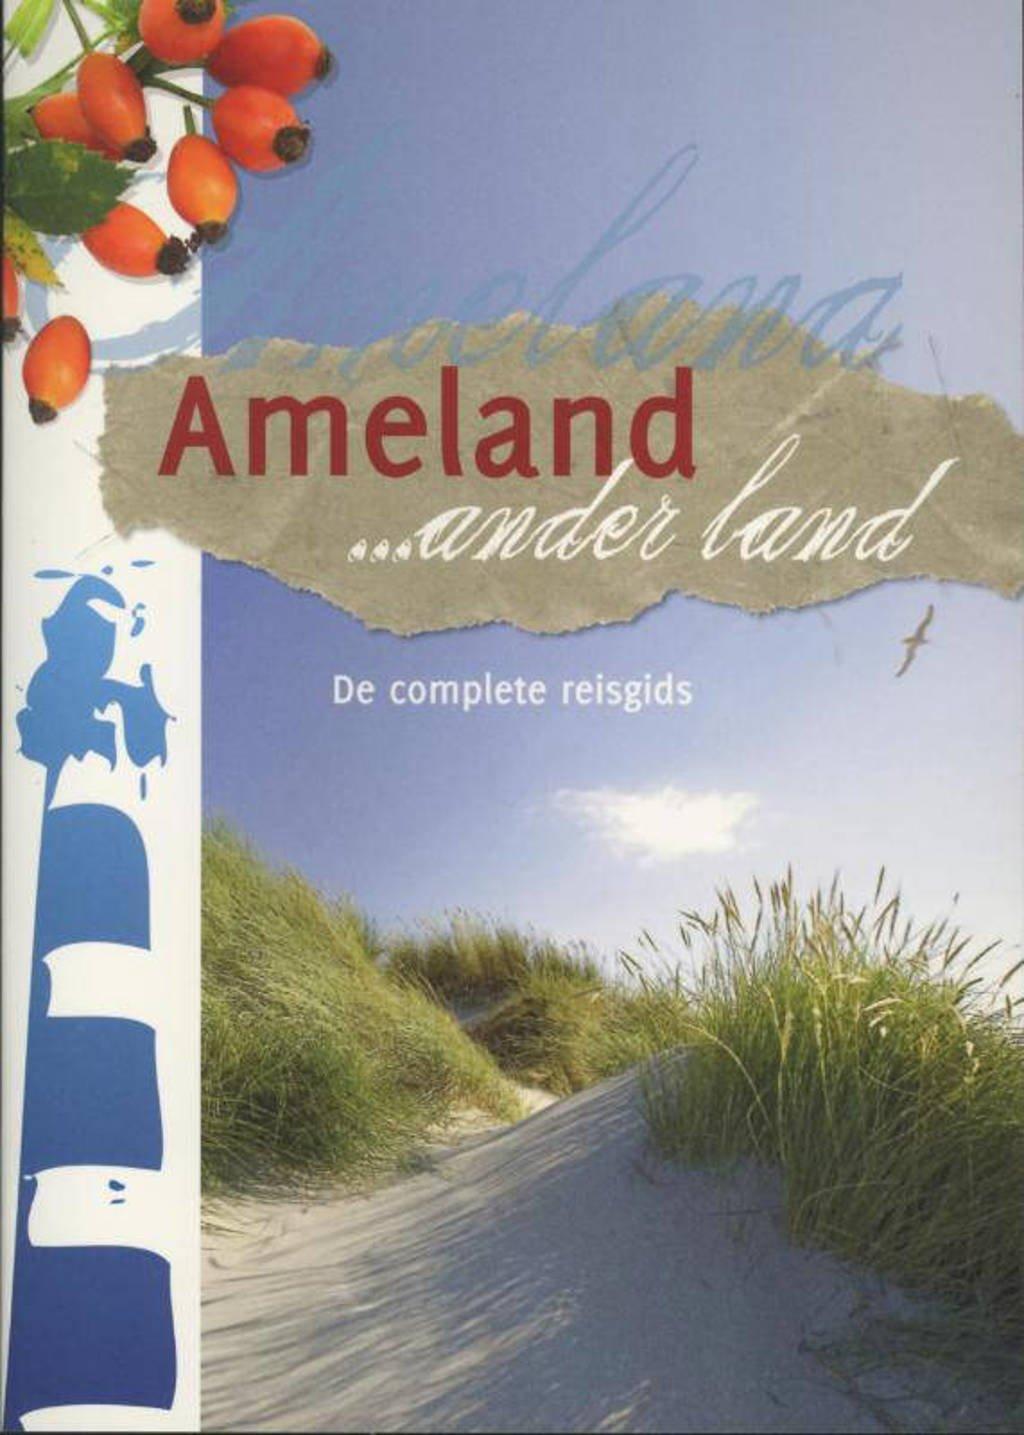 Ameland ... ander land - J. de Kruyf en R. Tienkamp